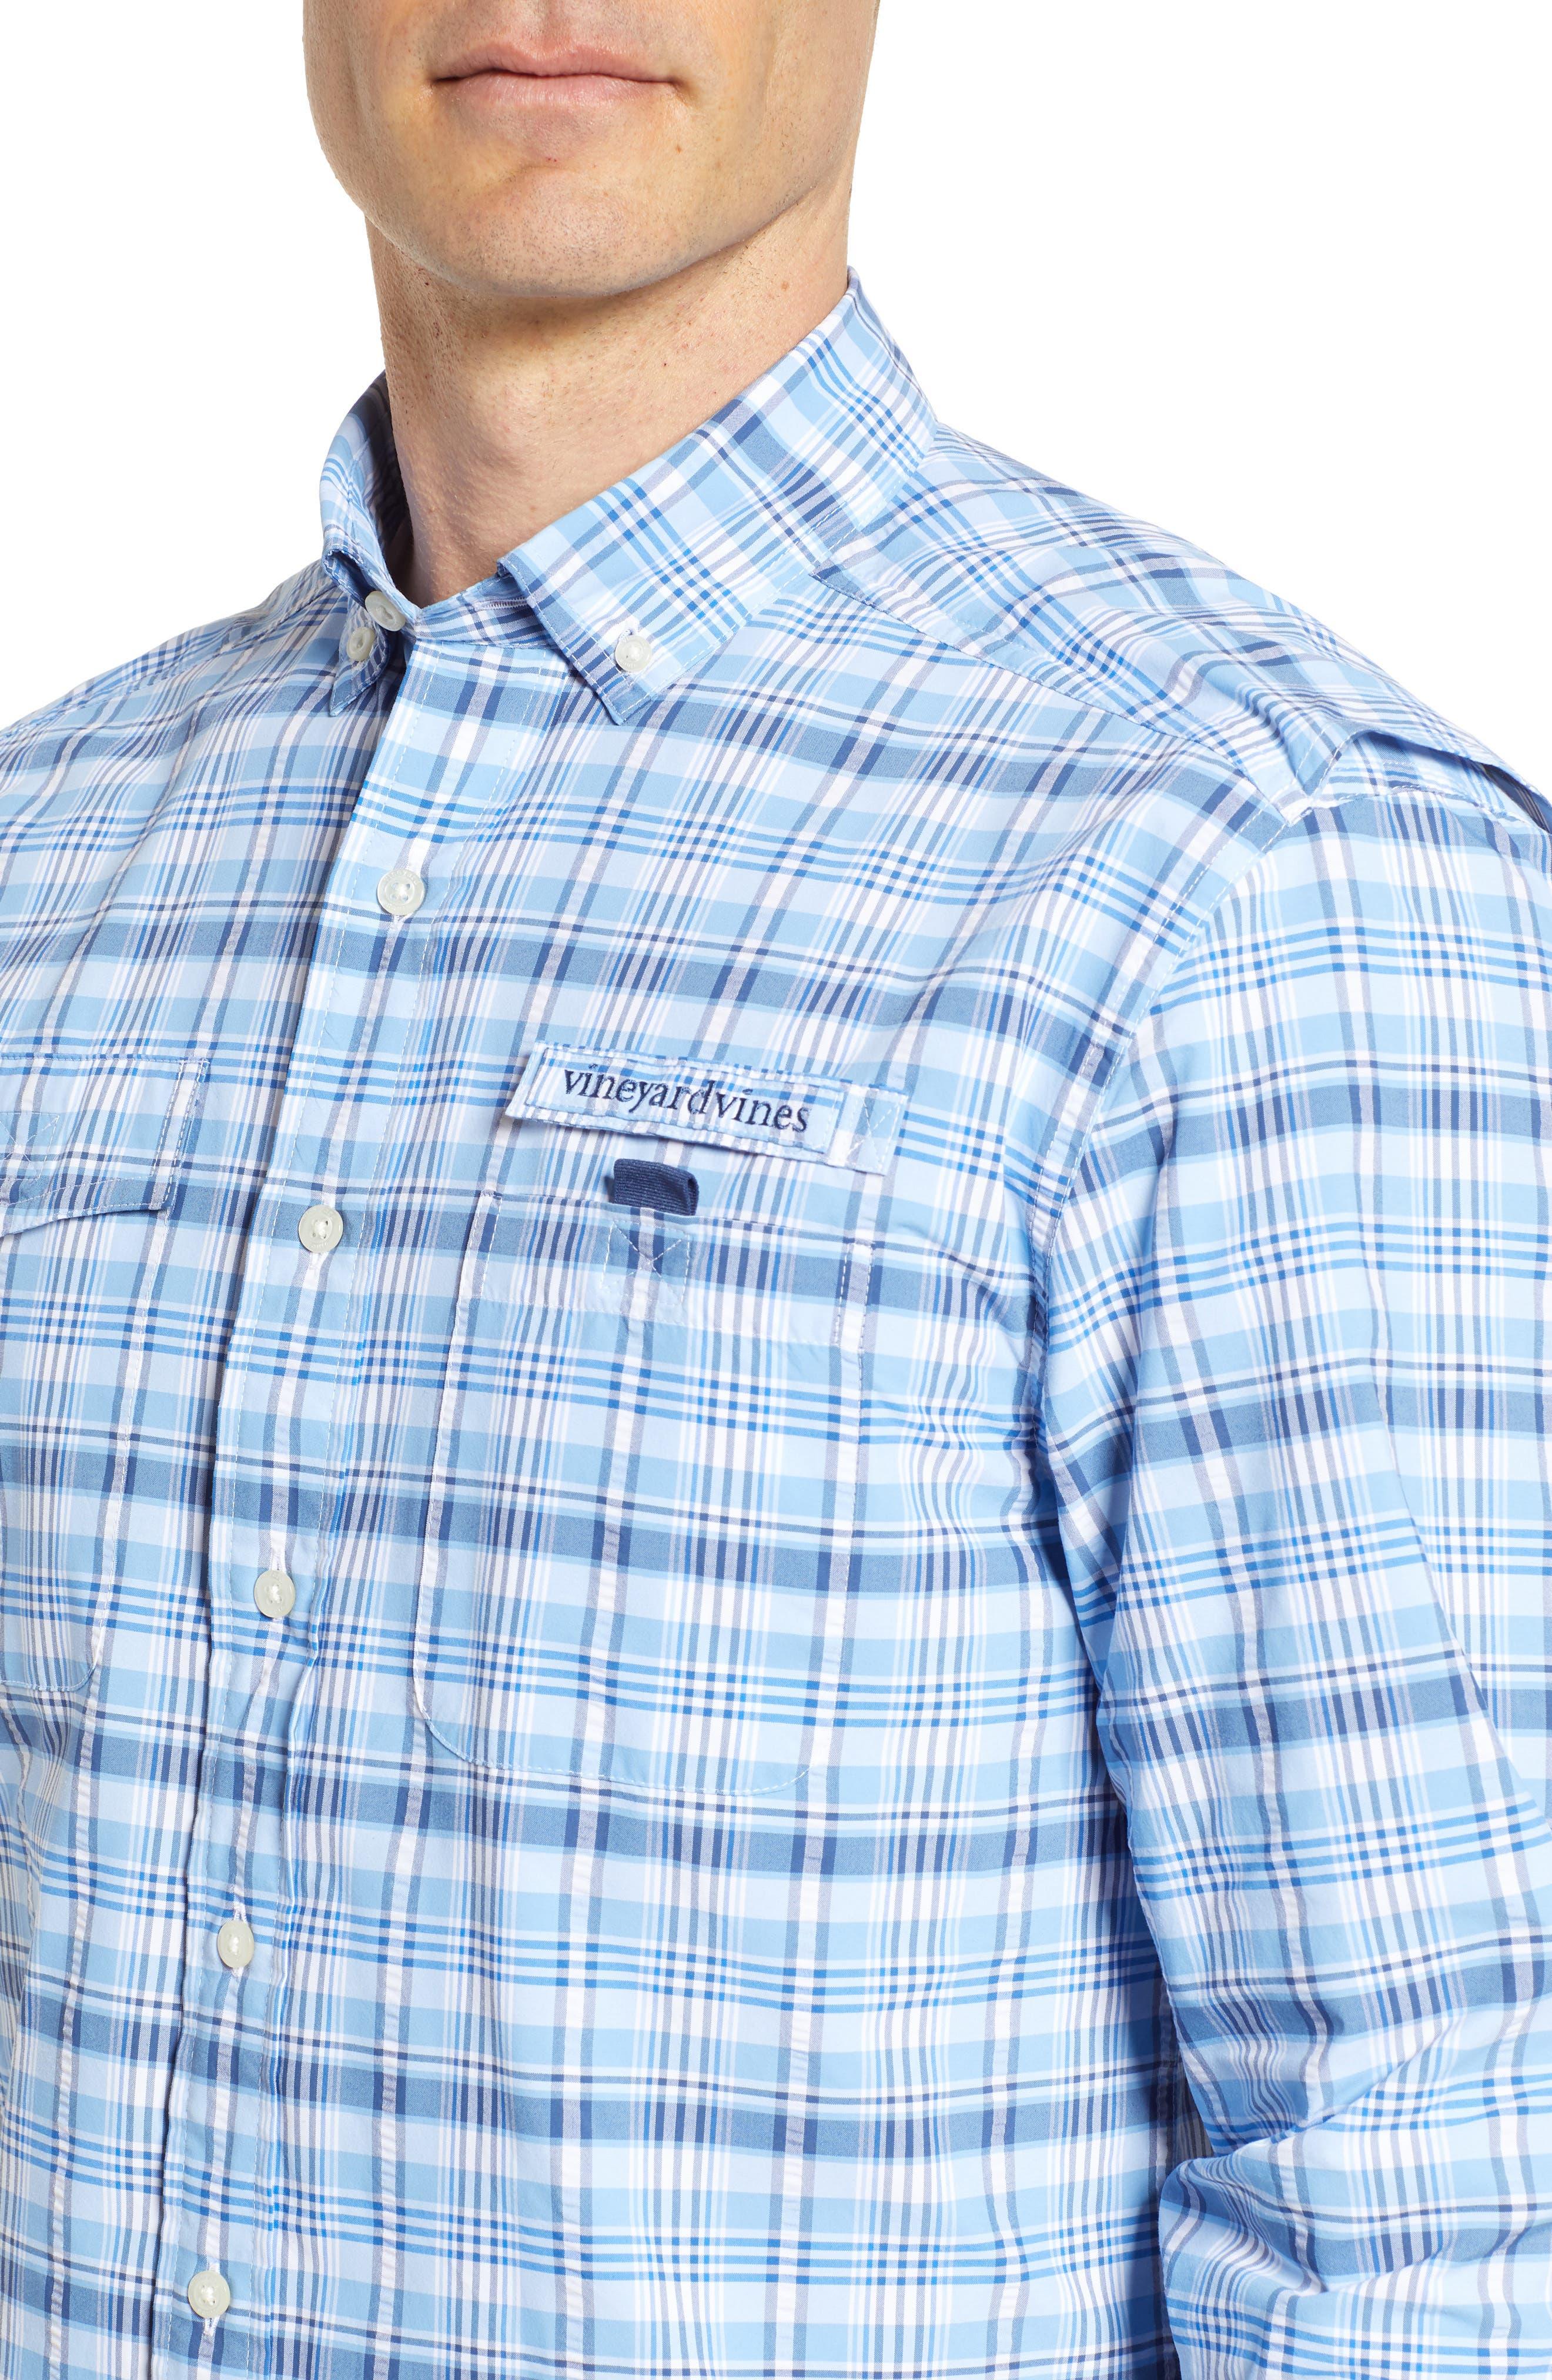 Prospect Hill Harbor Regular Fit Plaid Performance Sport Shirt,                             Alternate thumbnail 4, color,                             484